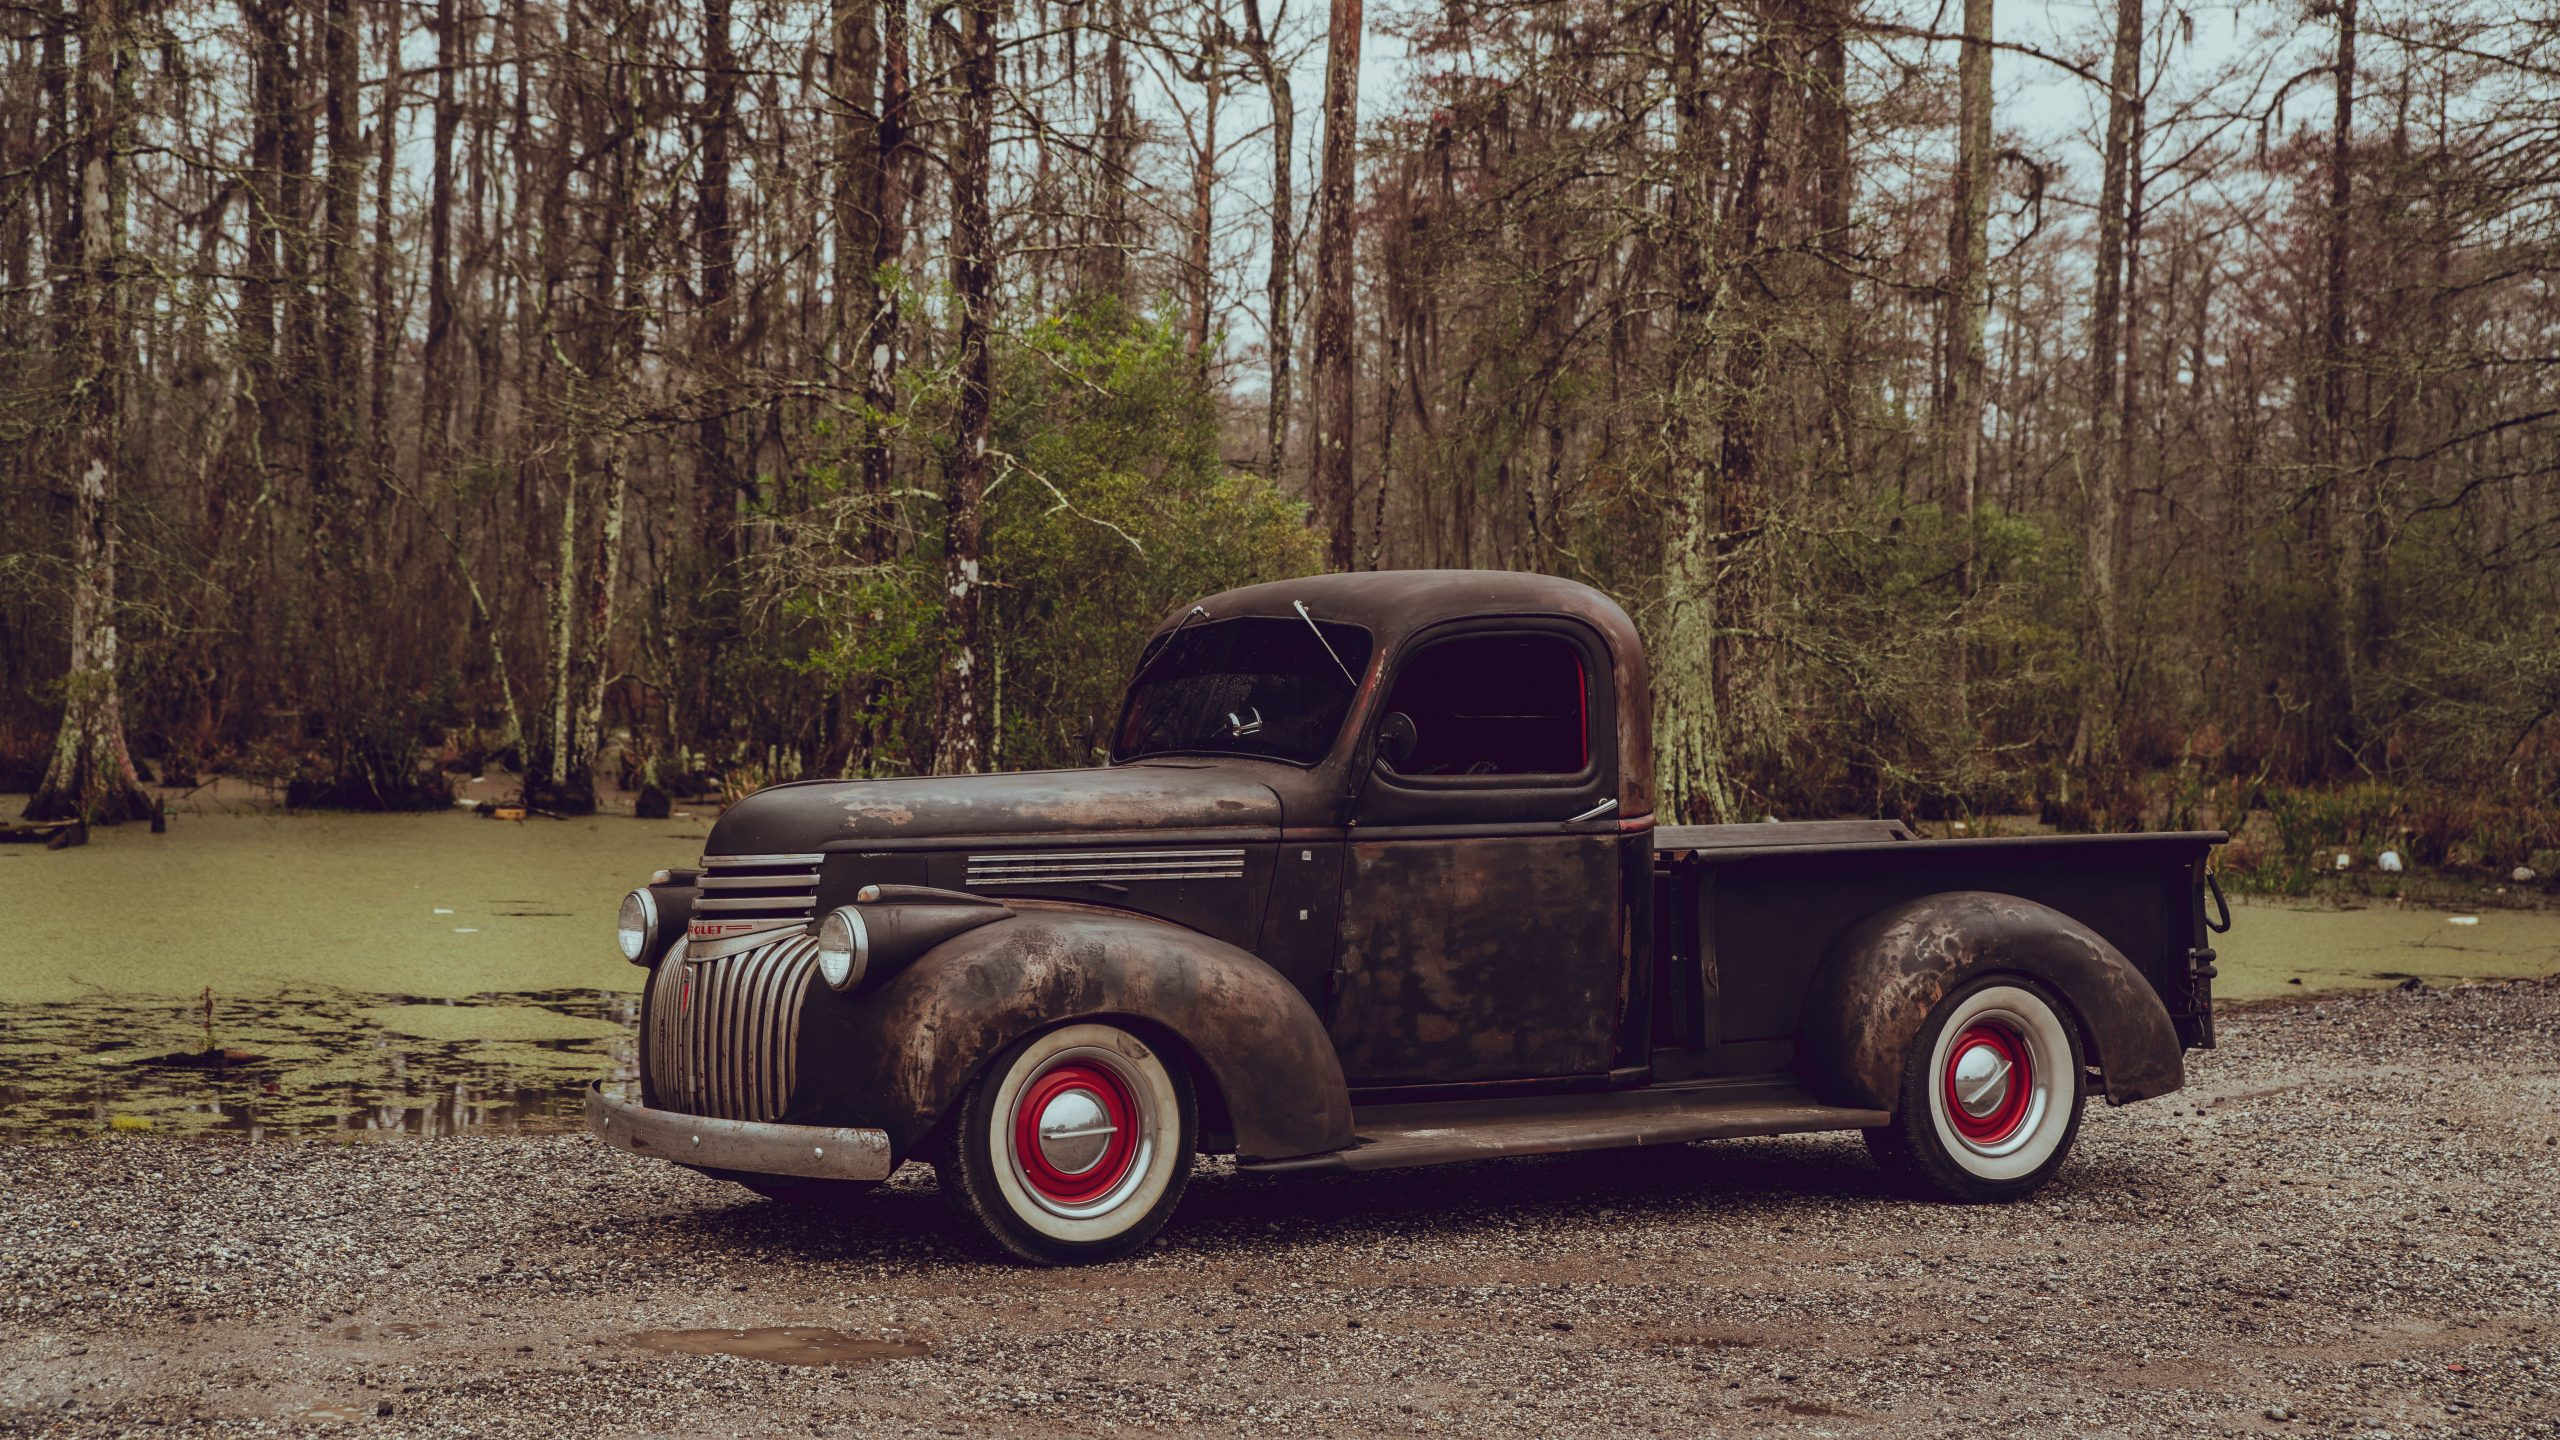 Curtis Vicknair's 1940 Chevrolet Pickup